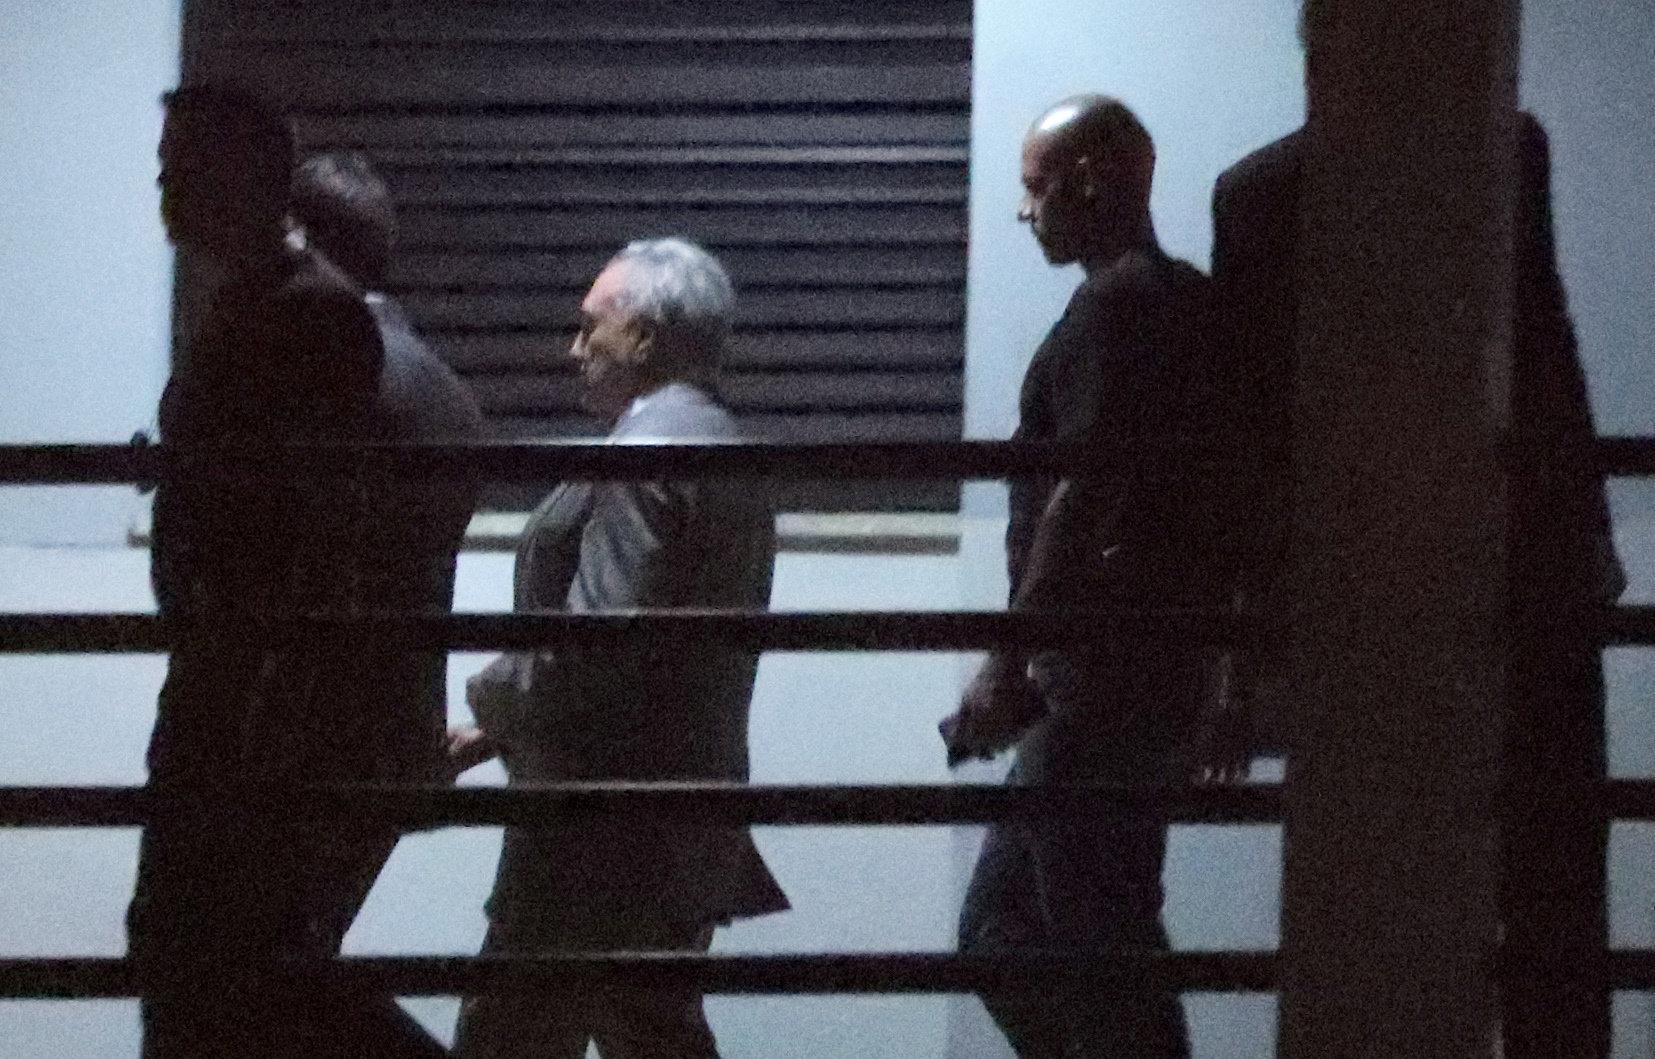 Temer fica em silêncio durante interrogatório; Habeas corpus só será julgado na